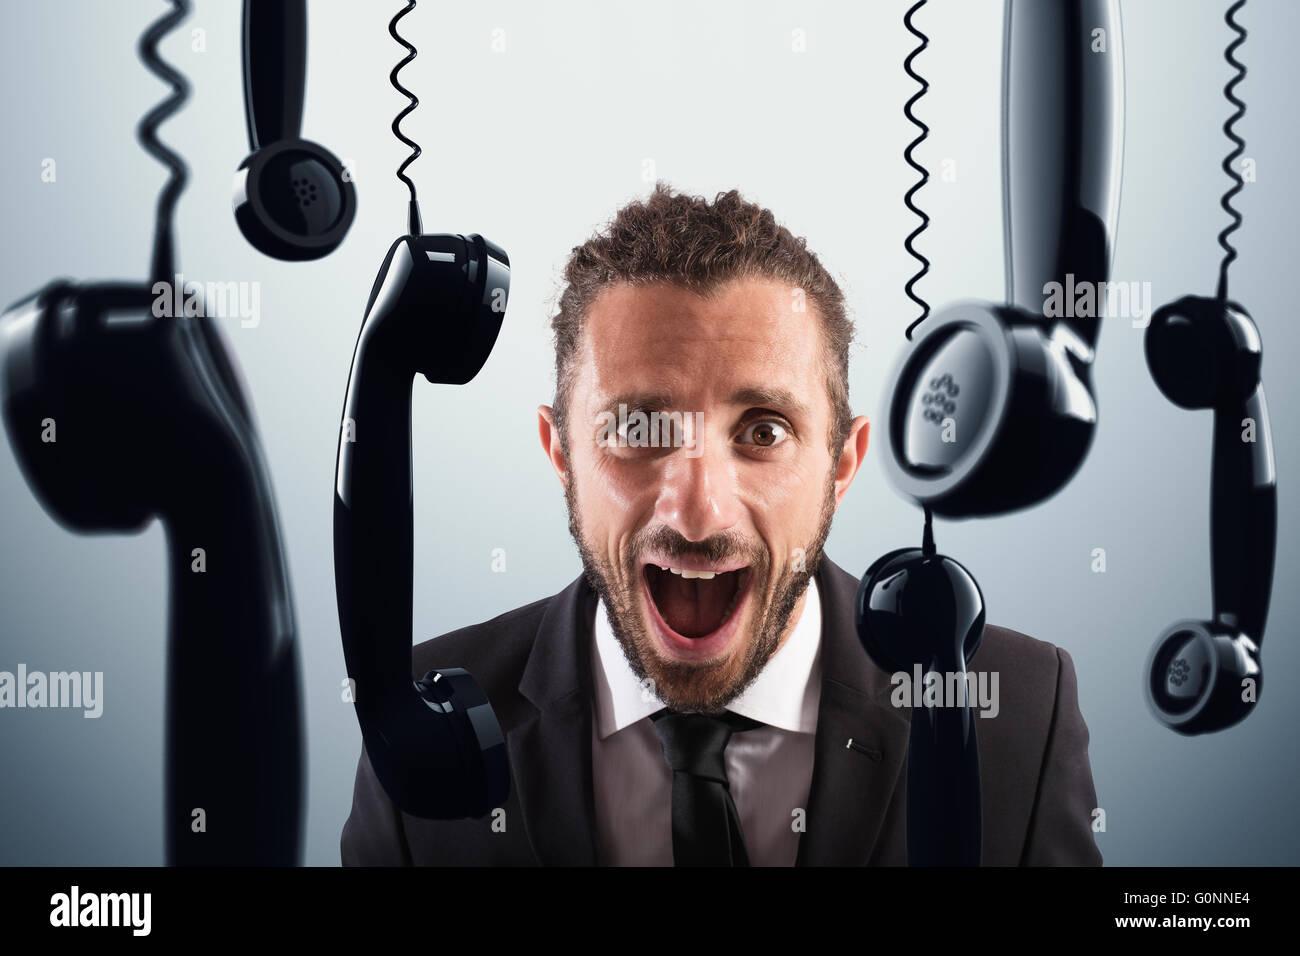 Stressful phone calls - Stock Image